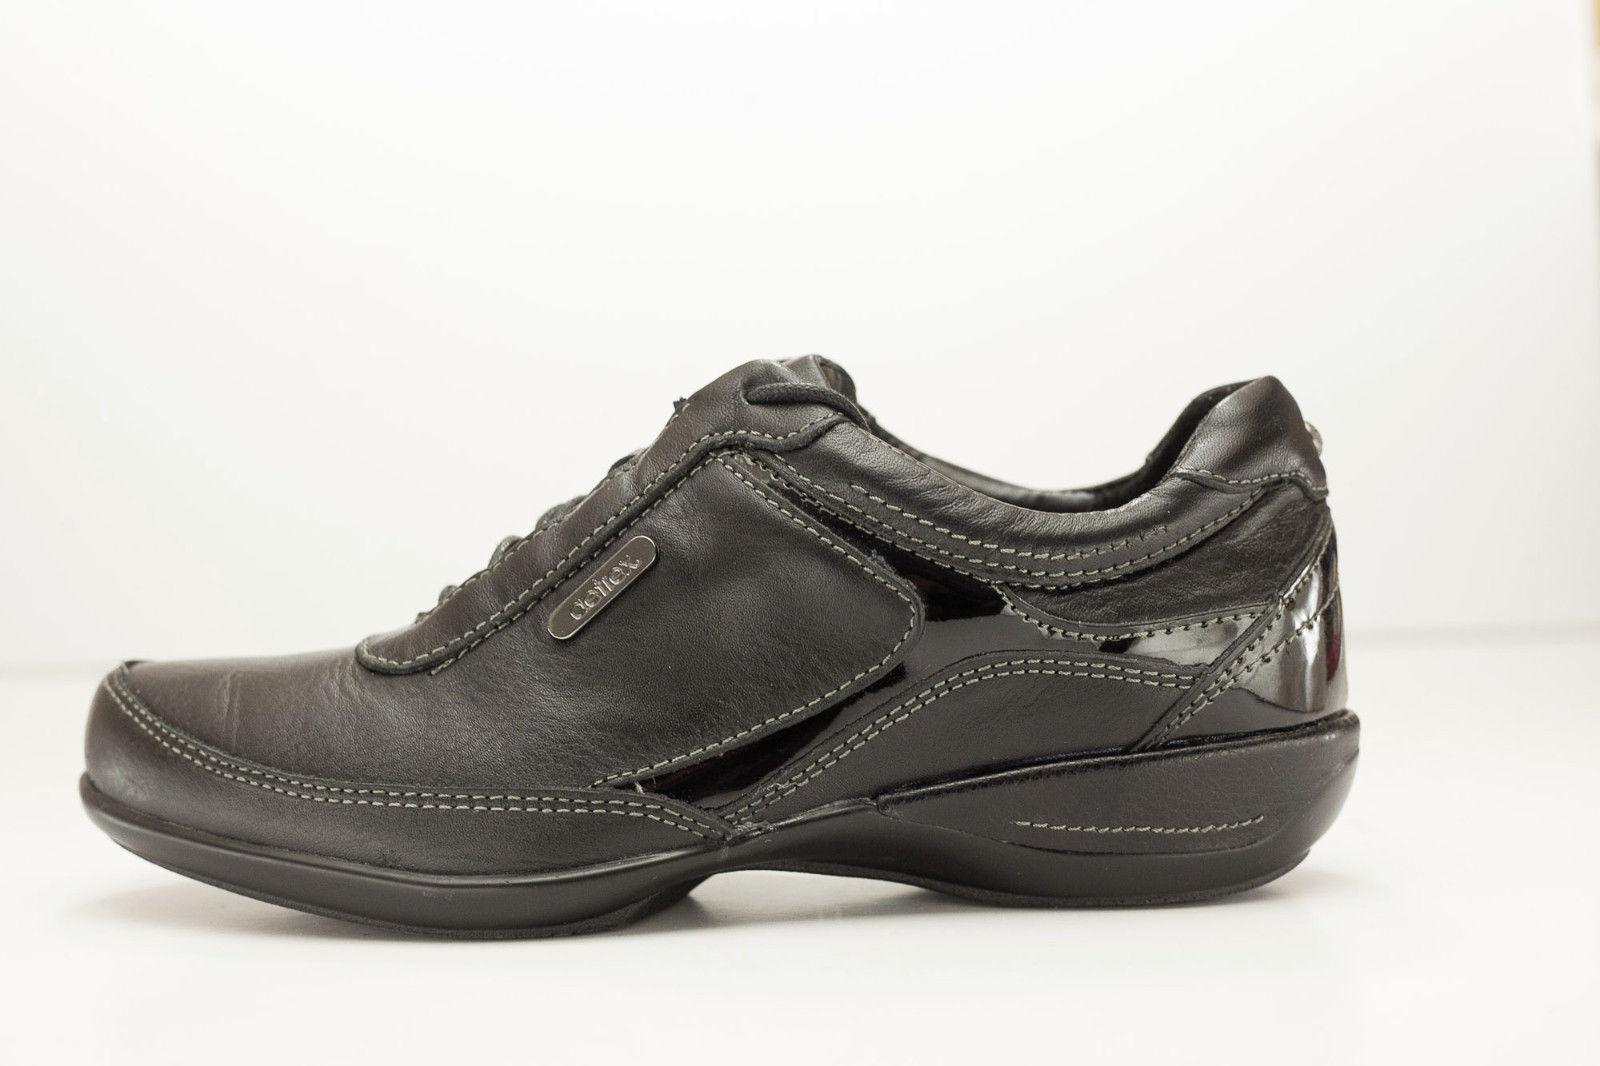 Aetrex Holly 6 Black Women's Shoes EU 37